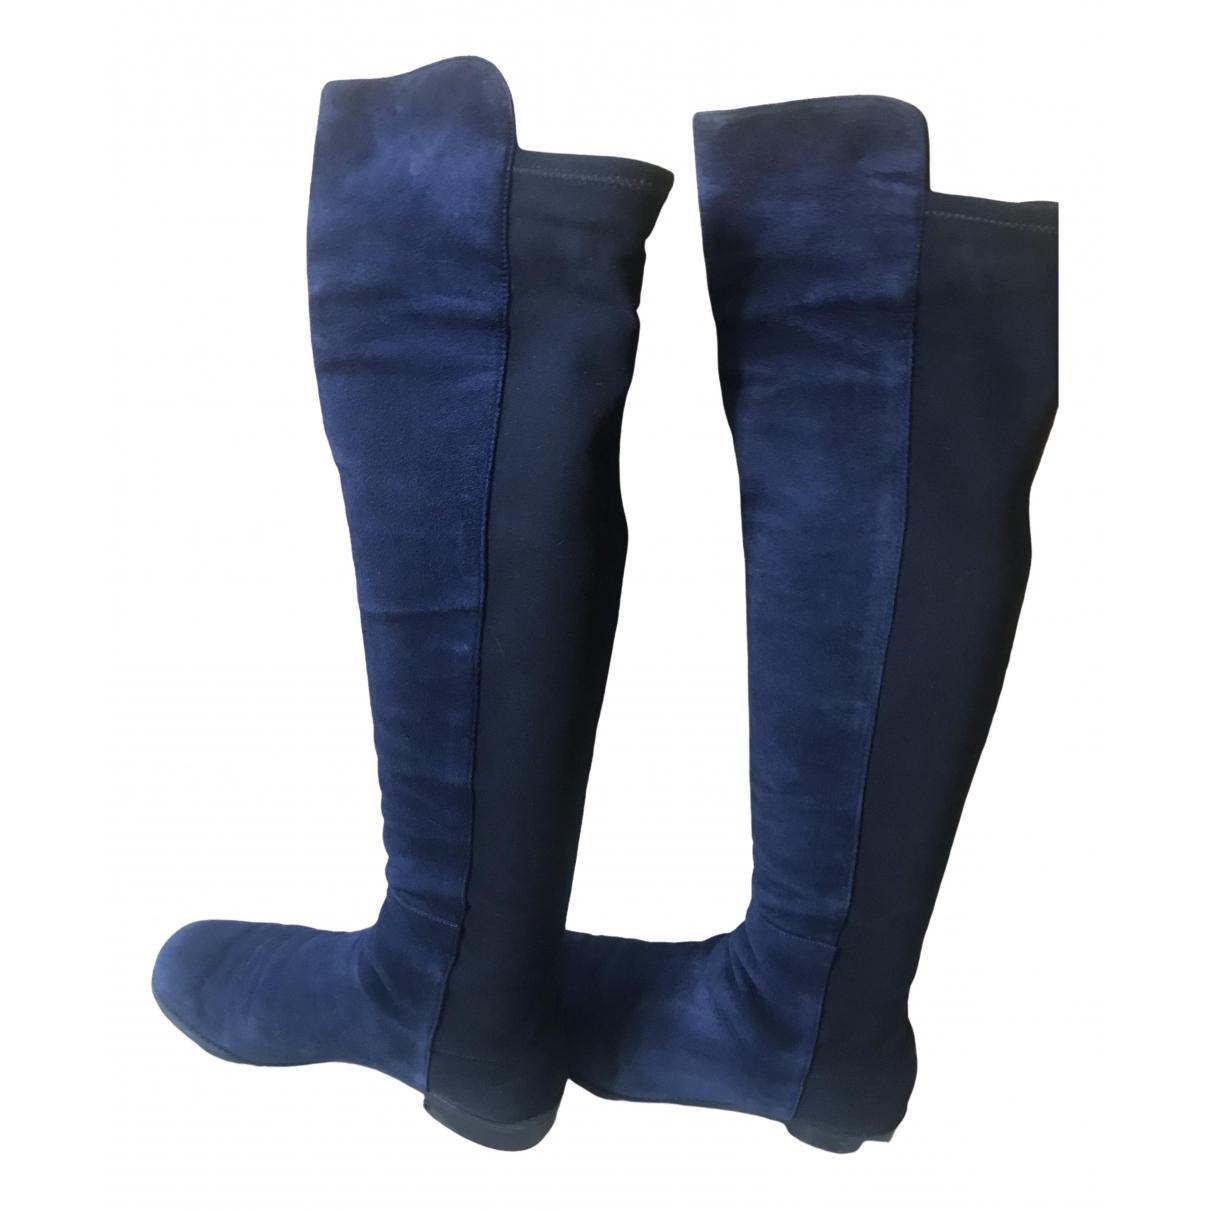 Stuart Weitzman \N Blue Leather Boots for Women 6.5 US